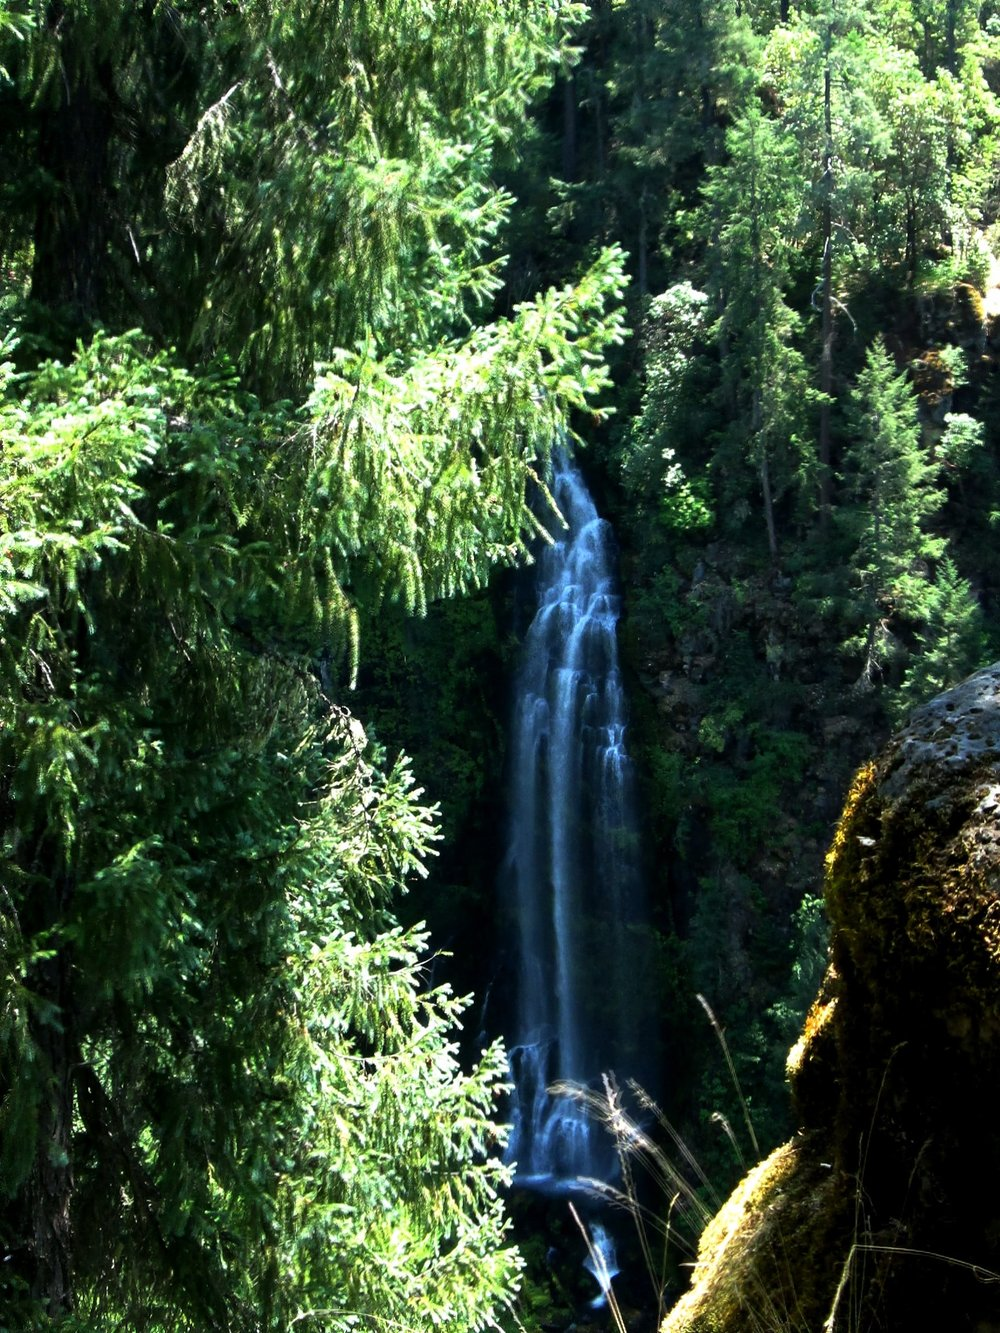 barrs-waterfall-oregon-min.jpg